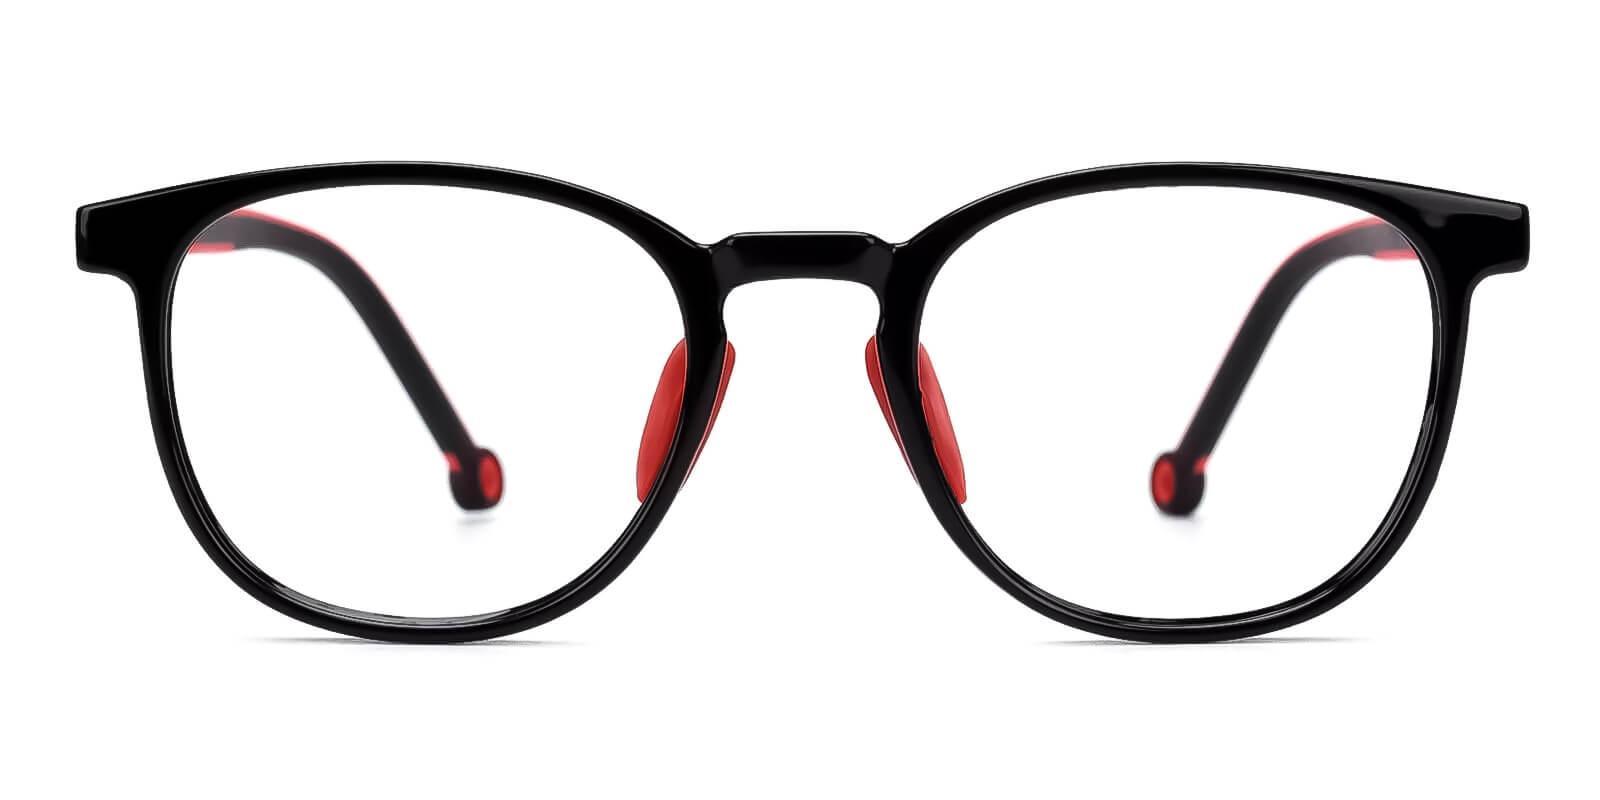 Kids-Trenta Black TR Eyeglasses , Fashion , UniversalBridgeFit Frames from ABBE Glasses